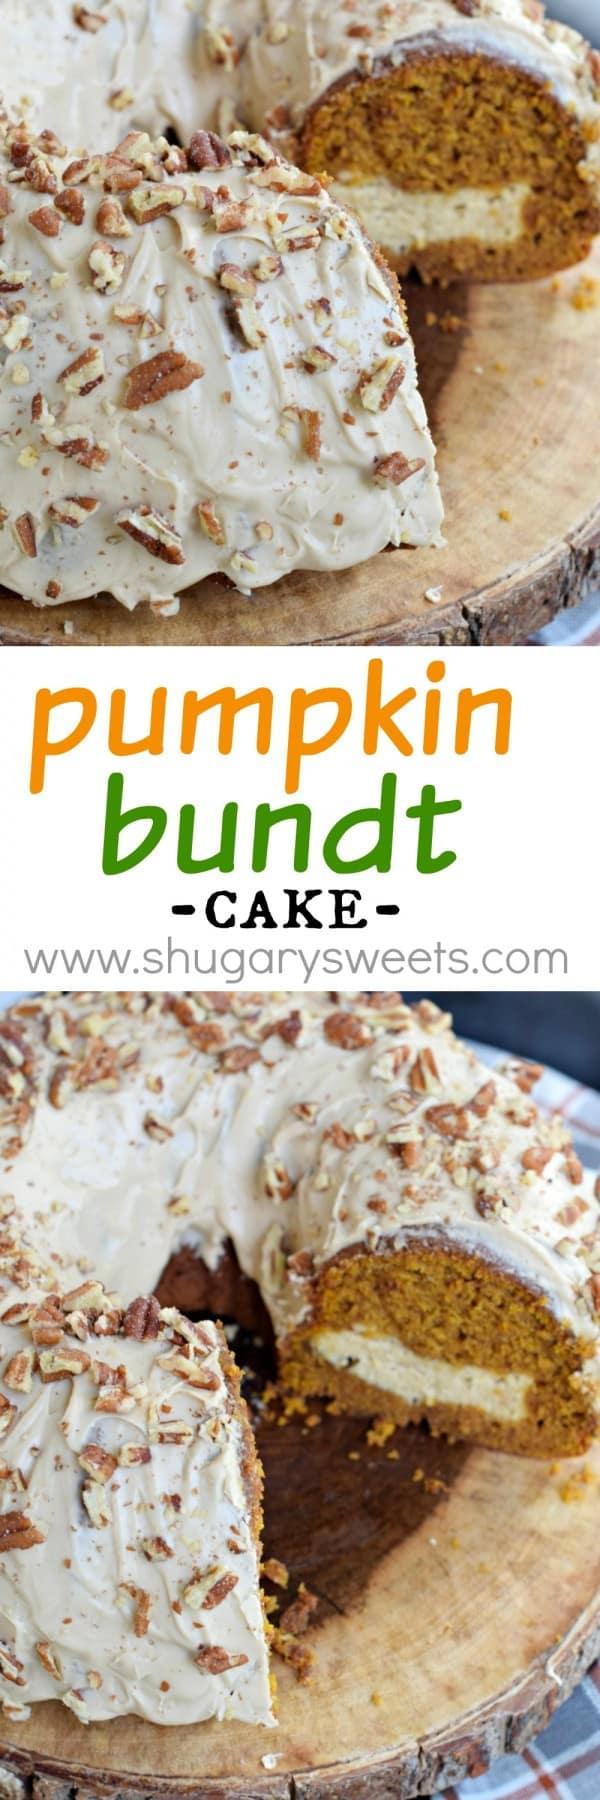 Pumpkin Cream Cheese Bundt Cake - Shugary Sweets